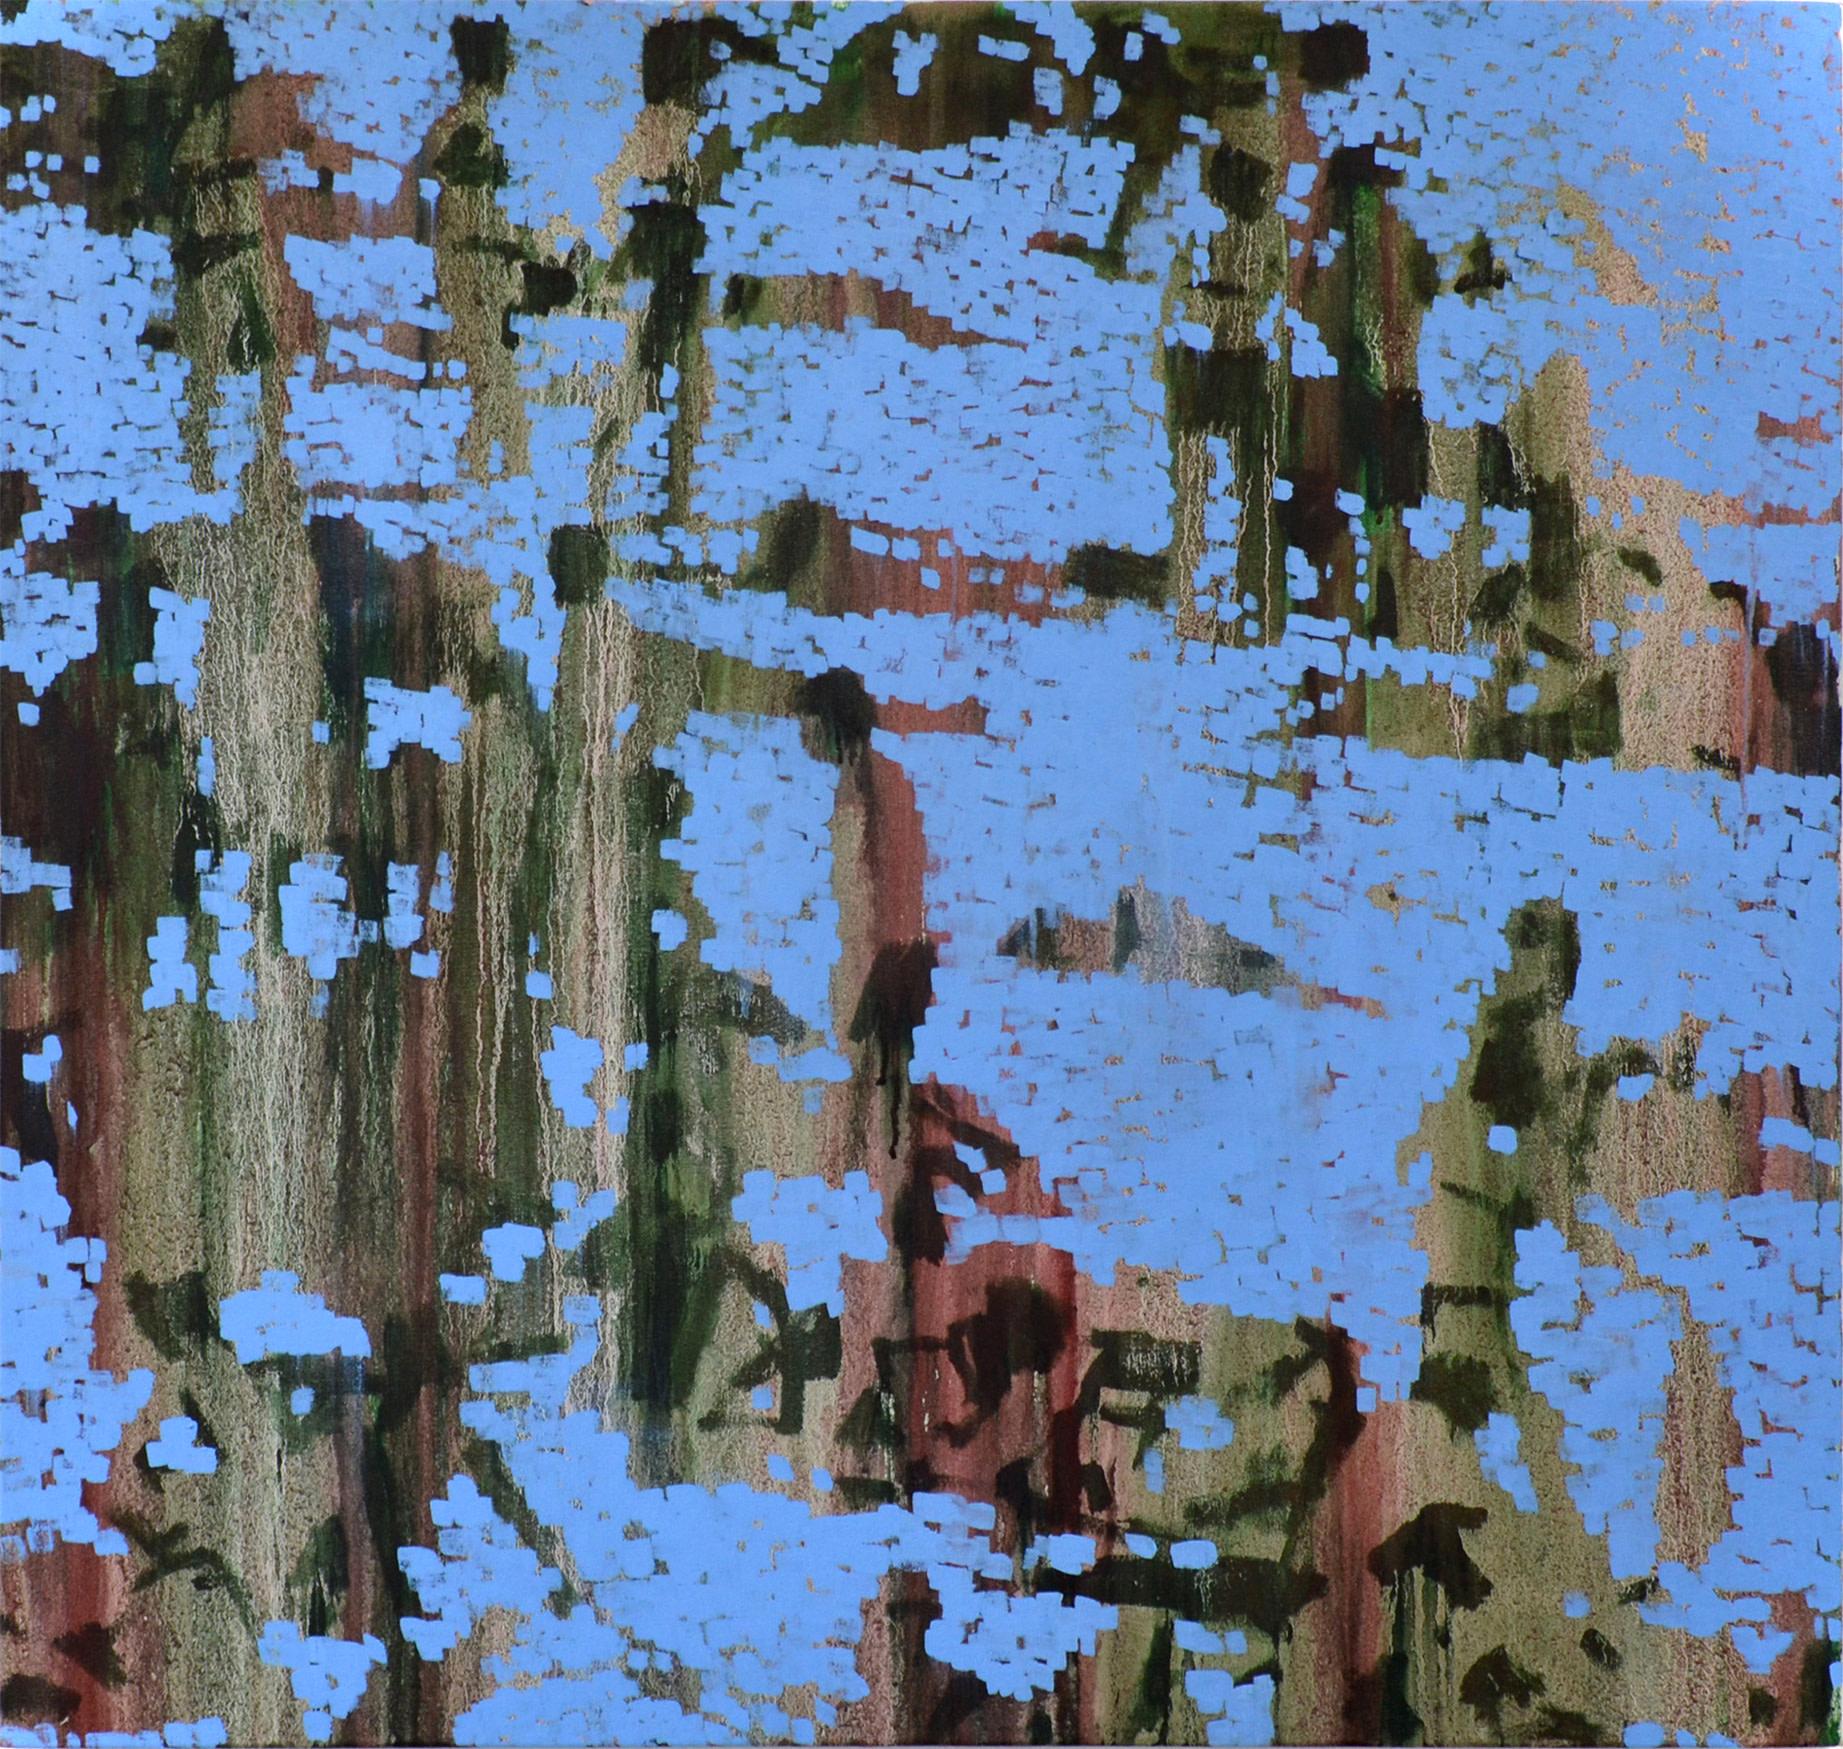 "<span class=""link fancybox-details-link""><a href=""/artists/42-nick-bodimeade/works/6386-nick-bodimeade-undertow-blue-2019/"">View Detail Page</a></span><div class=""artist""><strong>Nick Bodimeade</strong></div> (1957-) <div class=""title""><em>Undertow Blue</em>, 2019</div> <div class=""signed_and_dated"">signed, titled and dated on reverse</div> <div class=""medium"">oil on canvas</div> <div class=""dimensions"">86 x 92 cm</div><div class=""copyright_line"">OwnArt: £ 210 x 10 Months, 0% APR</div>"